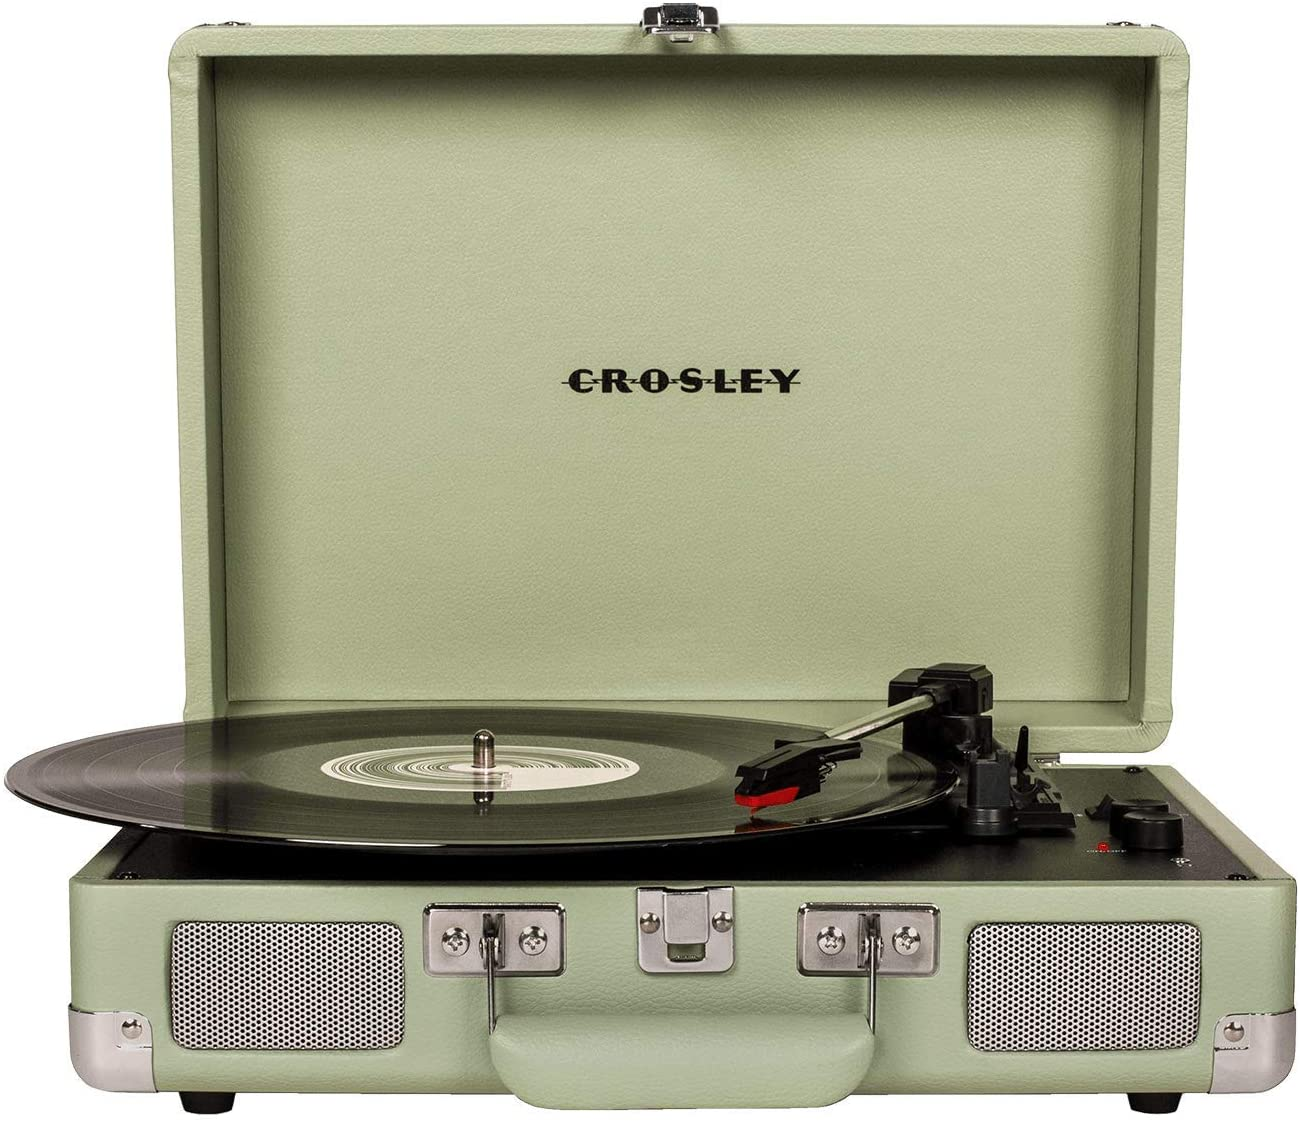 Crosley Cruiser Deluxe giradischi a valigetta color verde menta con bluetooth IN